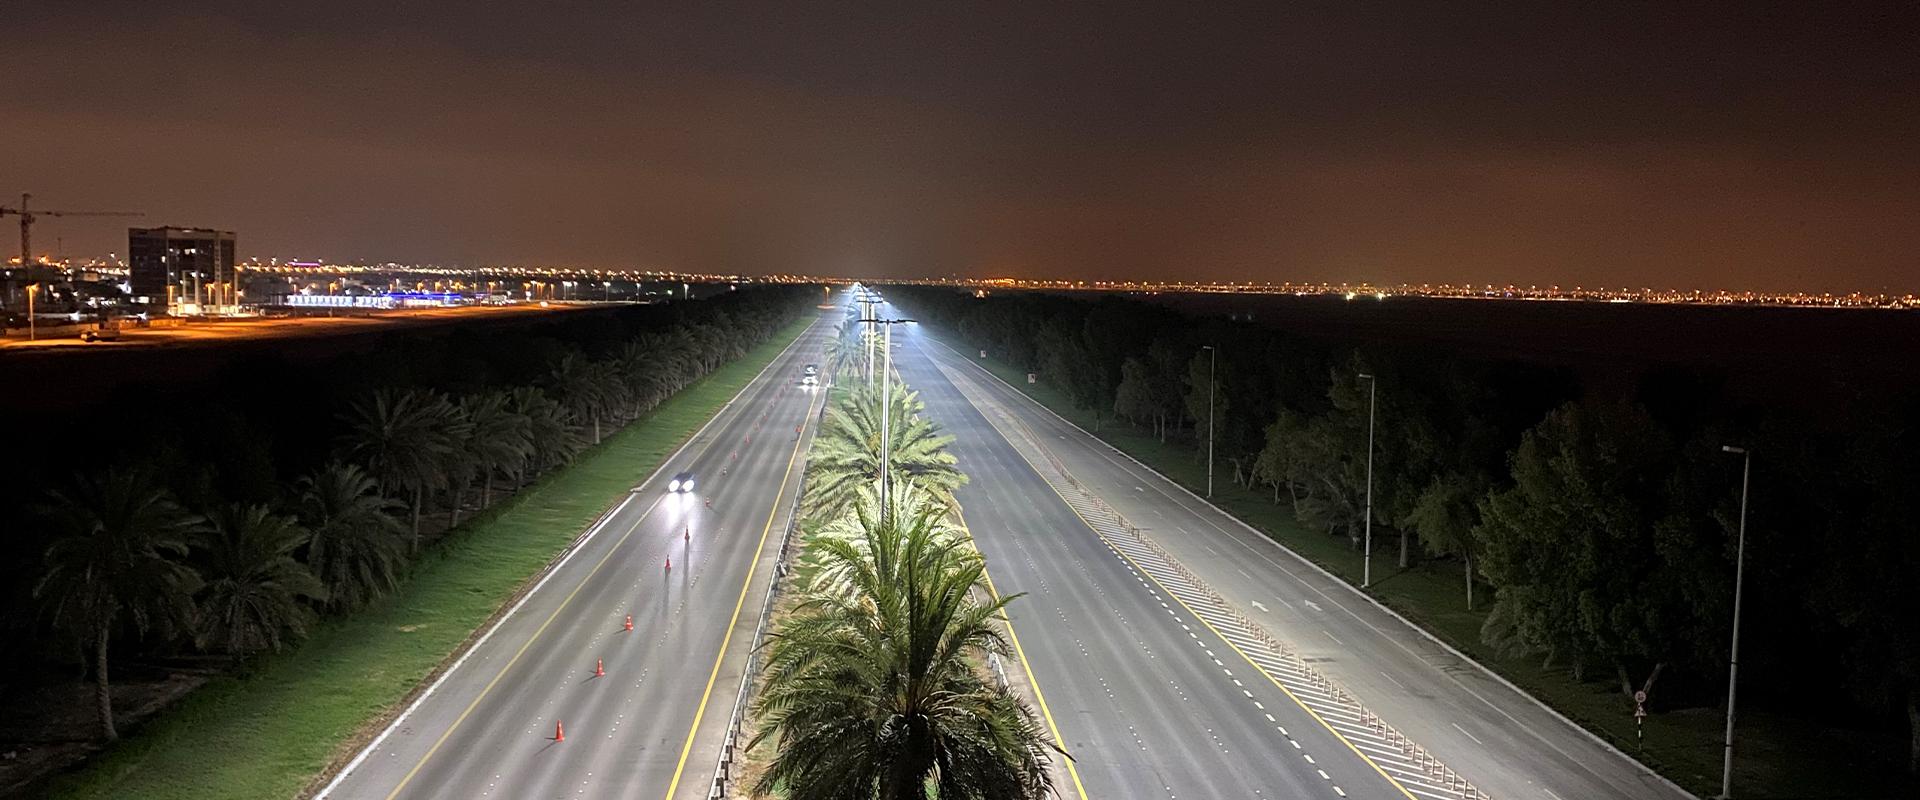 Illuminazione stradale LED di Abu Dhabi